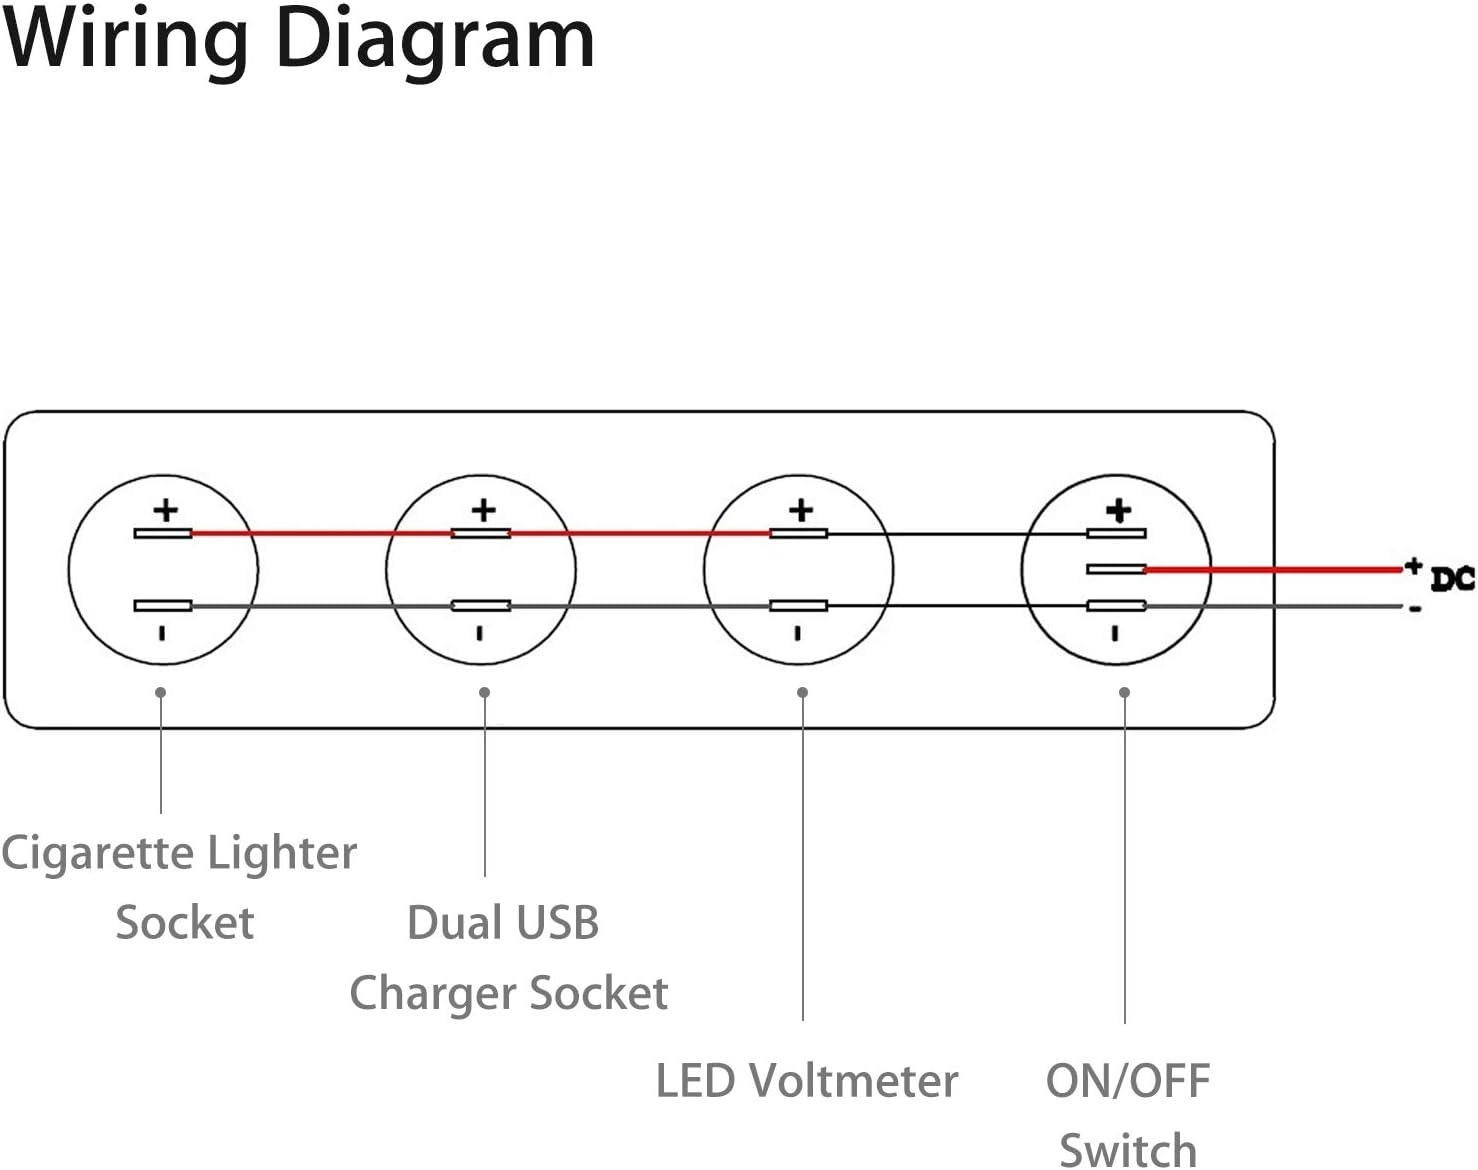 Amazon Com Linkstyle 4 In 1 Marine Switch Panel 12v 4 2a Dual Usb Charger Socket Power Outlet Led Voltmeter Cigarette Lighter Socket Led Lighted On Off Rocker Toggle Switch For